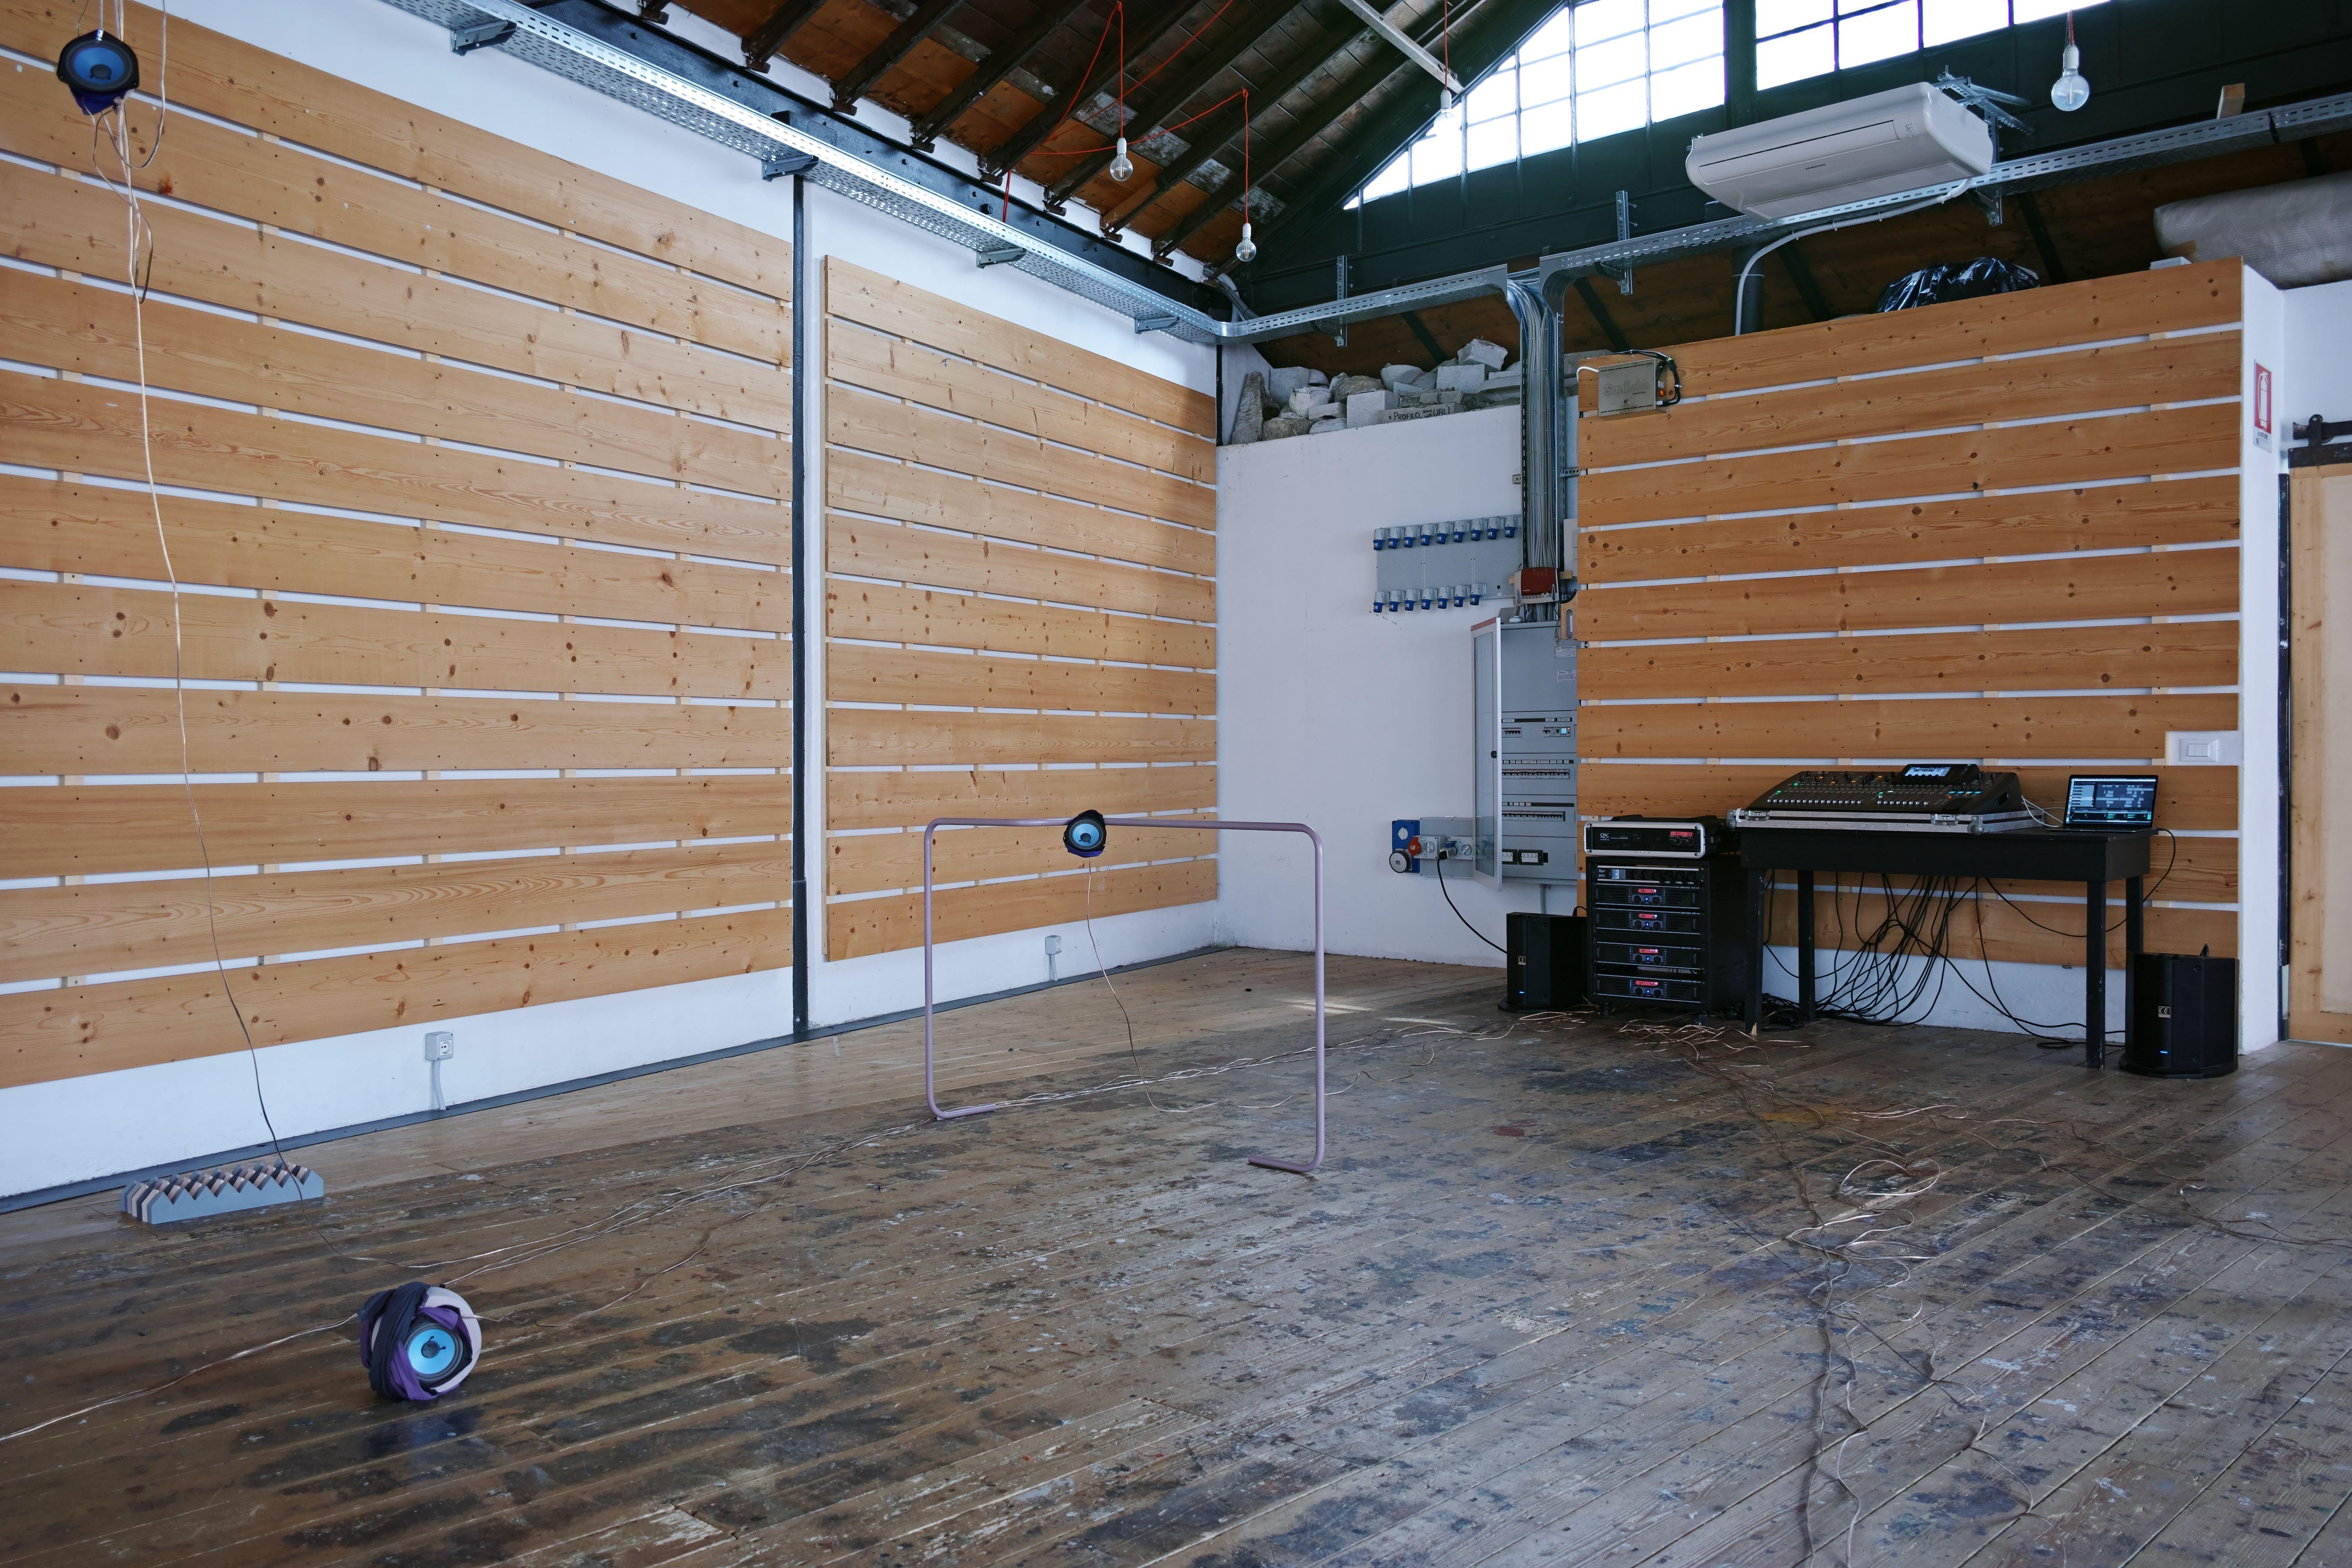 speaker, powder-coated bent metal structures, audio cables, Jesmonite sculpture, Polyester fabric